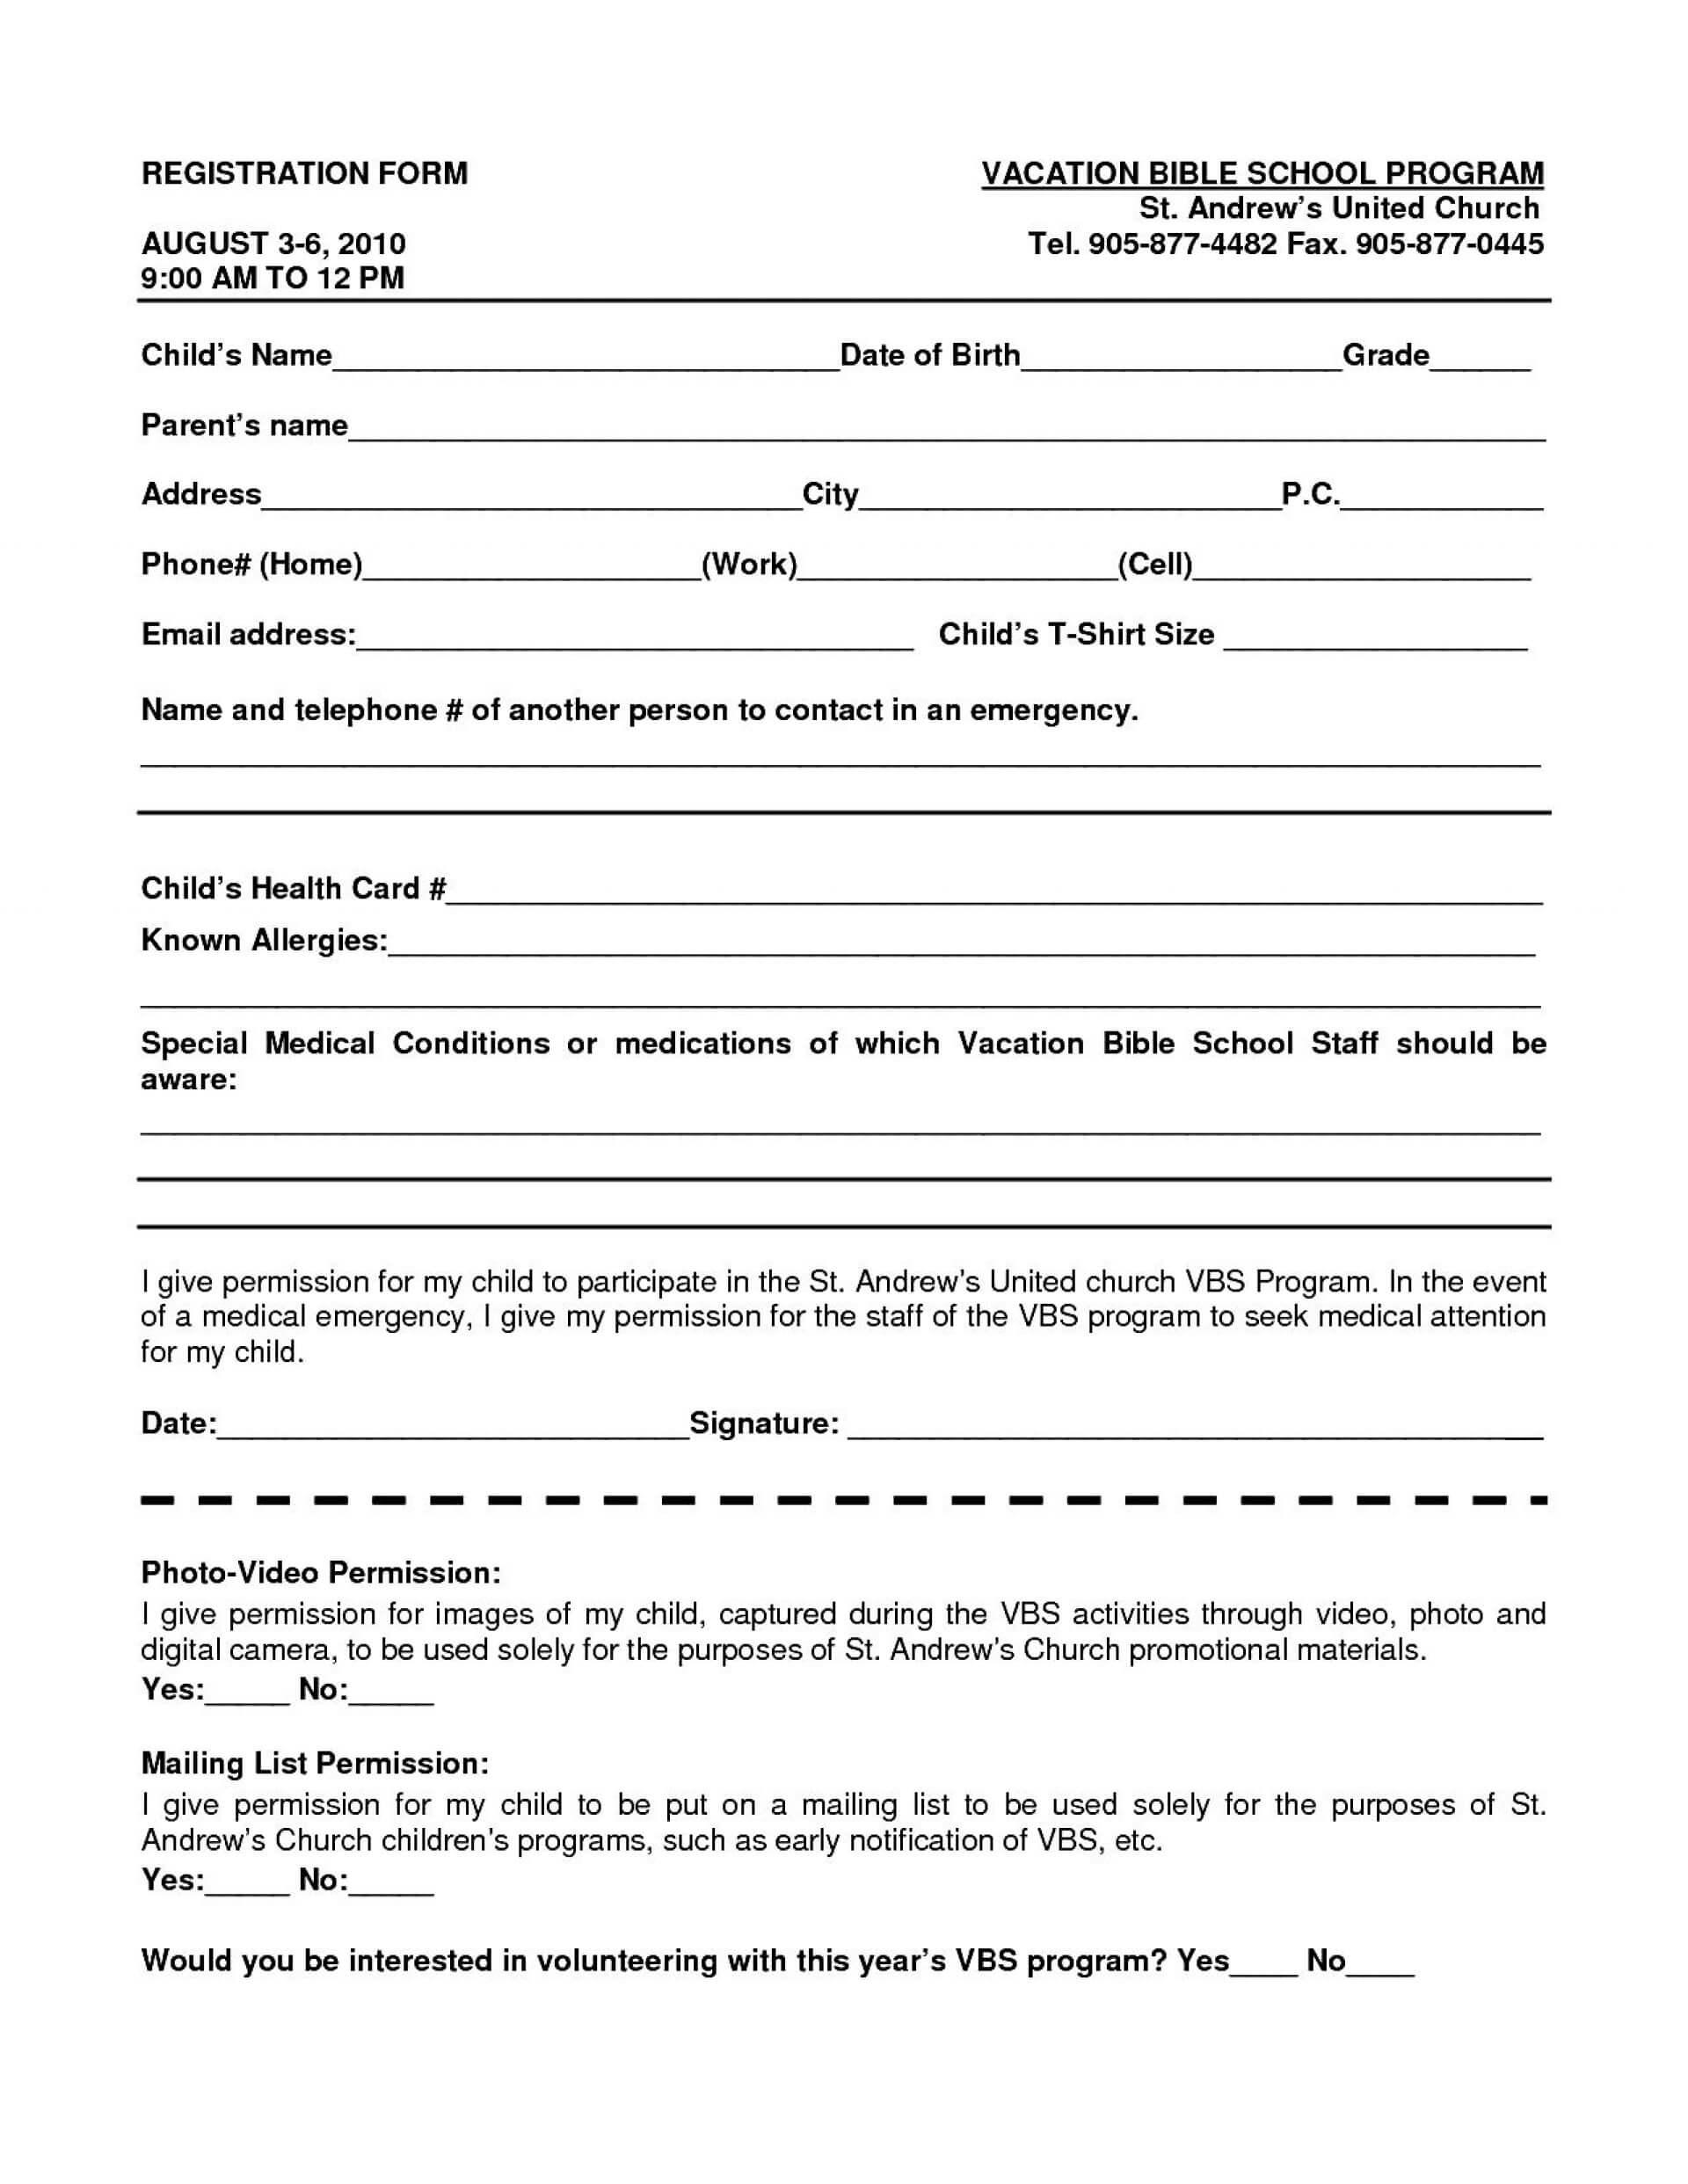 023 School Registration Form Template Word 102813 Ideas Free Within School Registration Form Template Word